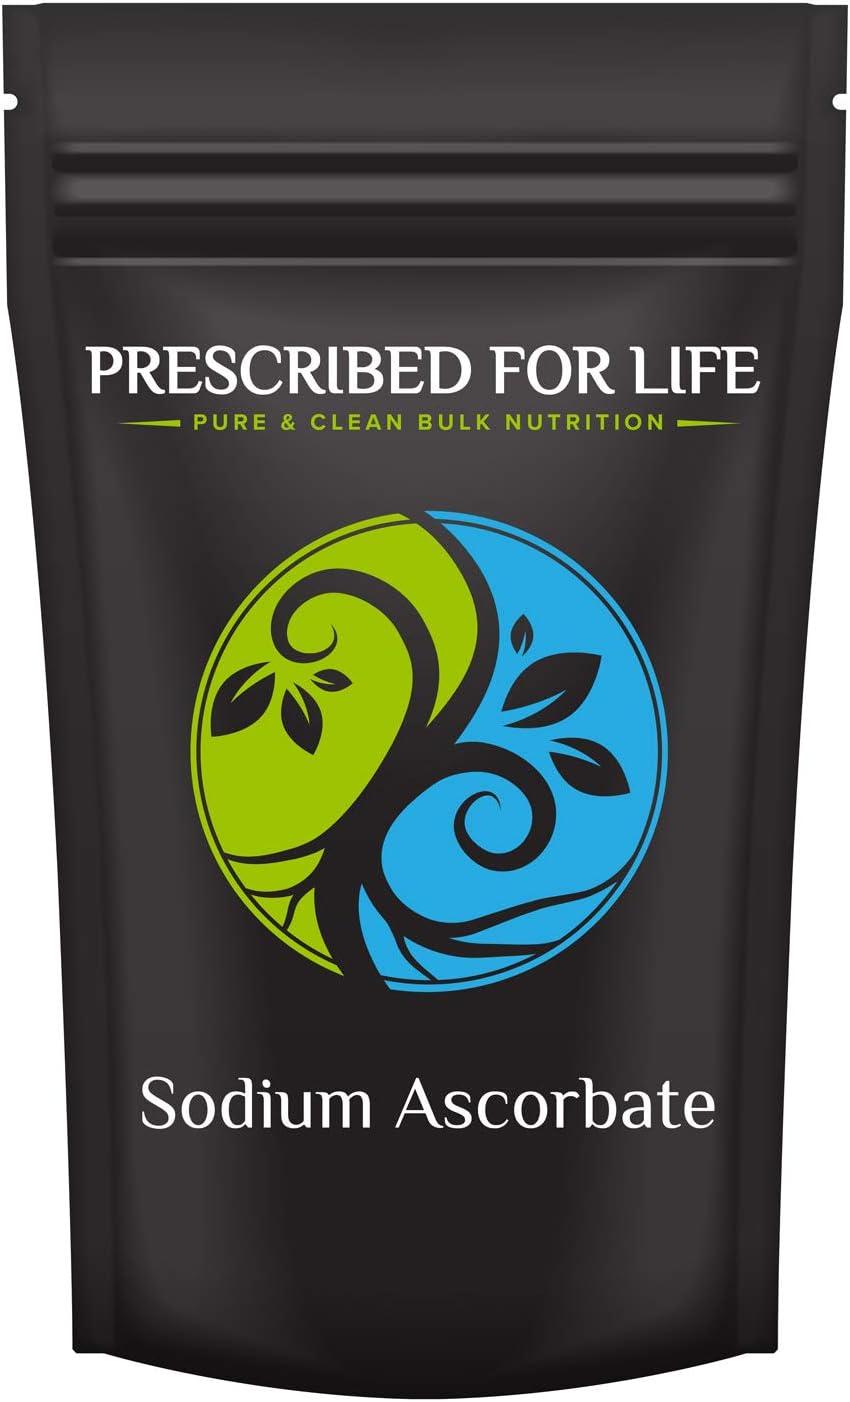 Prescribed for Life Ascorbic Acid (L) - Pure USP Grade Vitamin C - Crystalline Powder 40-80 Mesh, 10 kg